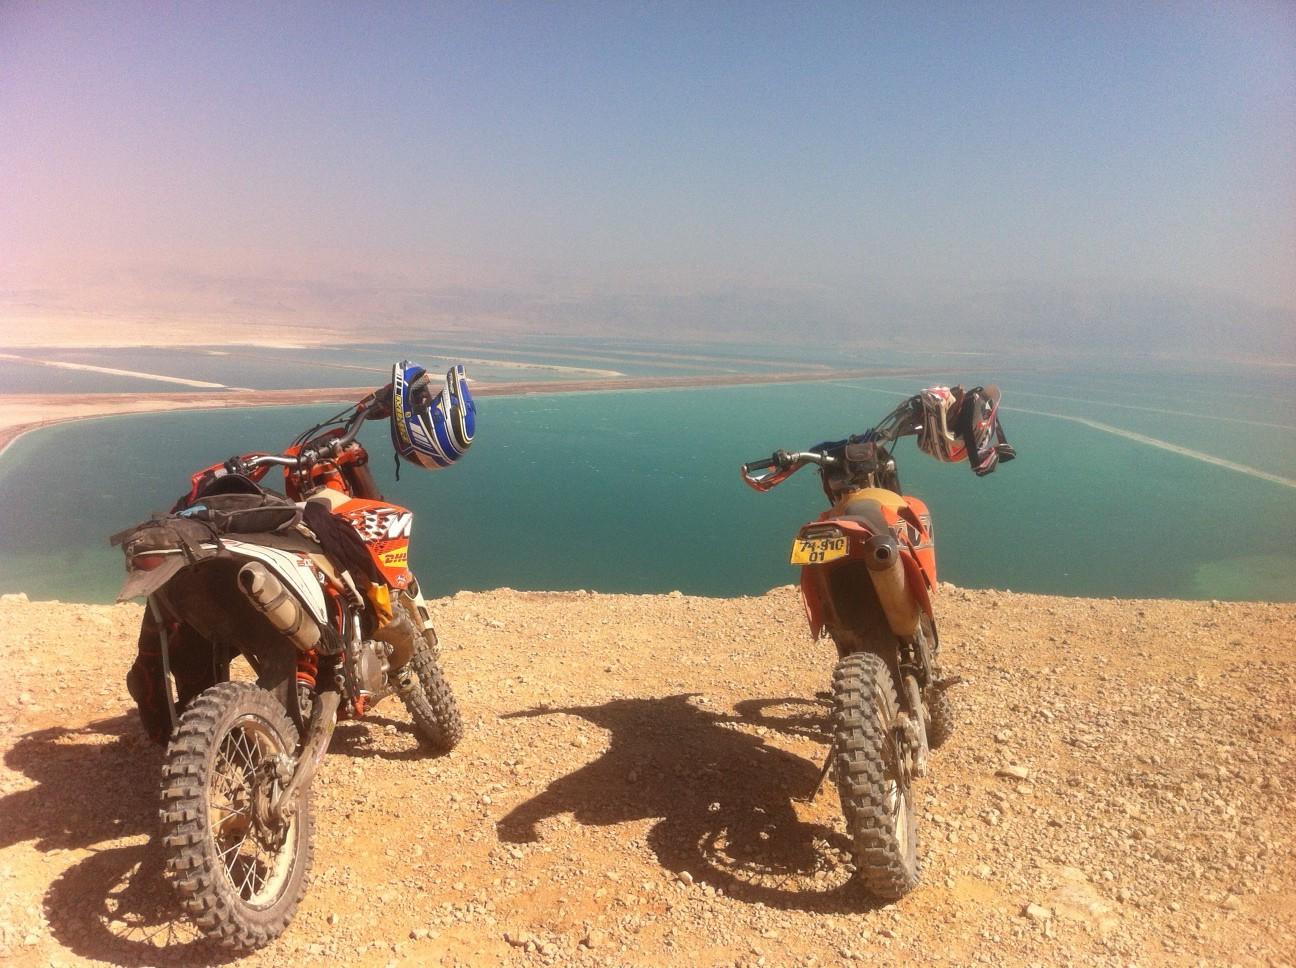 Overlooking the Dead Sea.